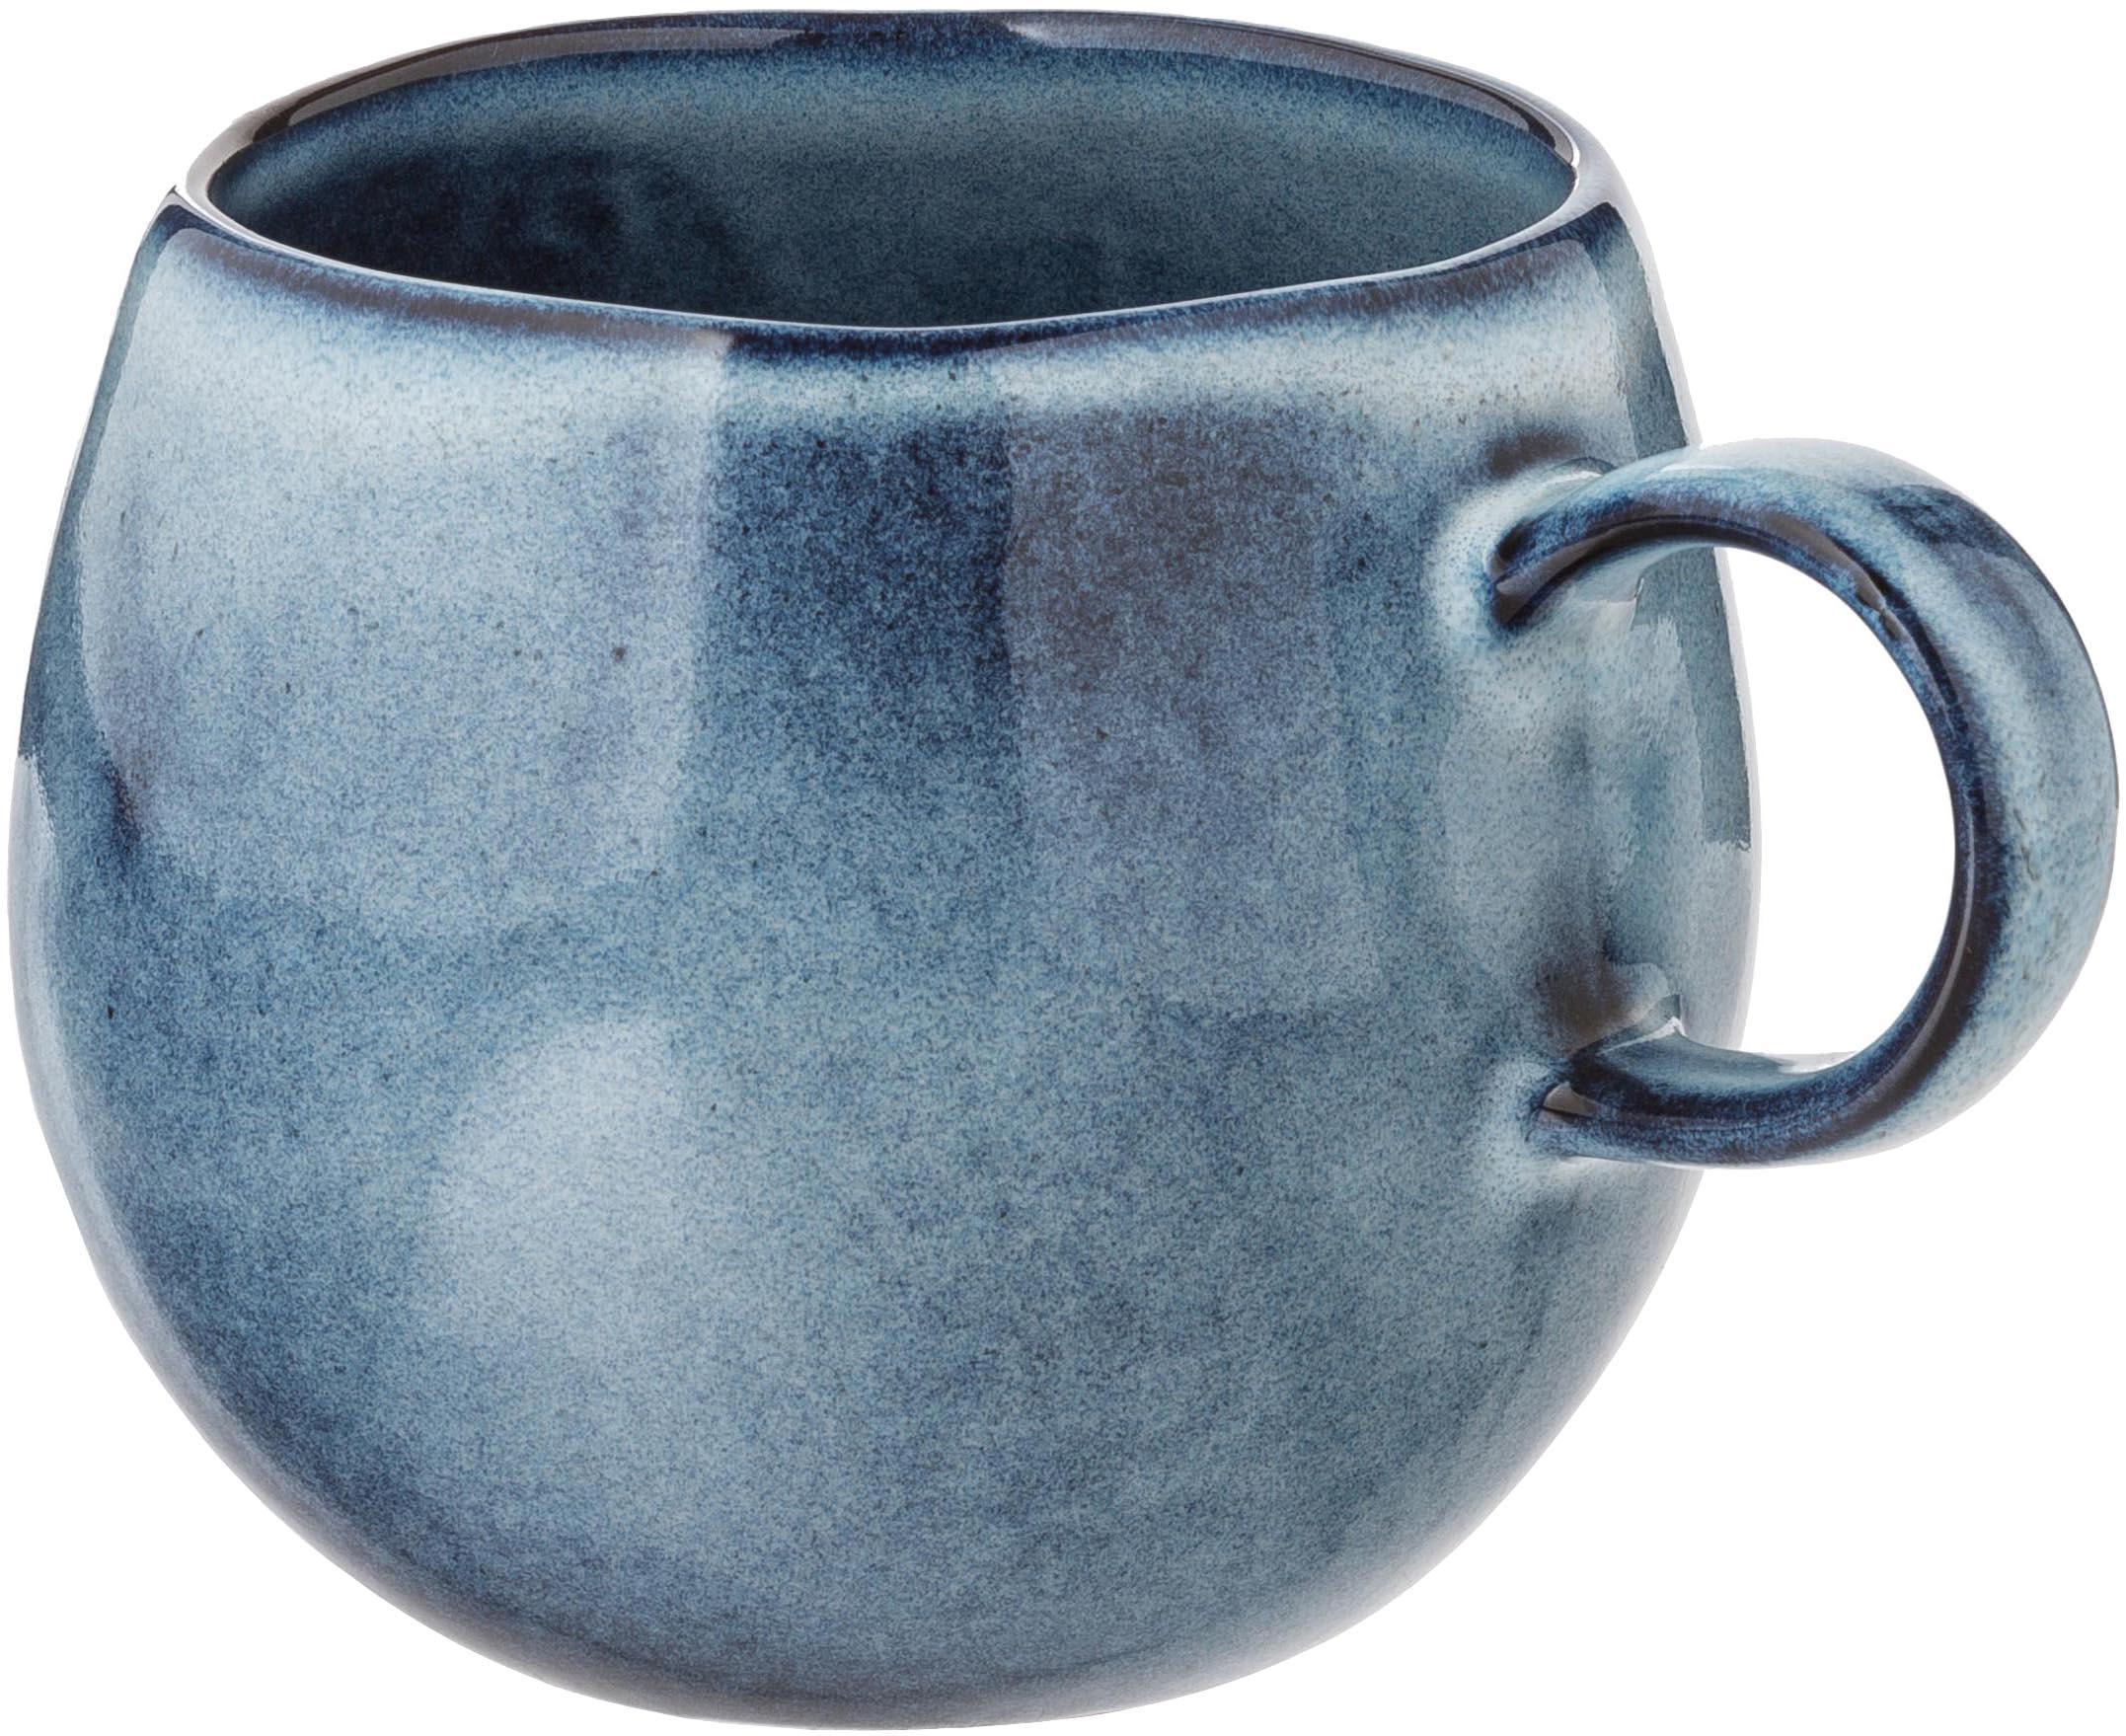 Taza artesanal Sandrine, Gres, Tonos azules, Ø 10 x Al 10 cm